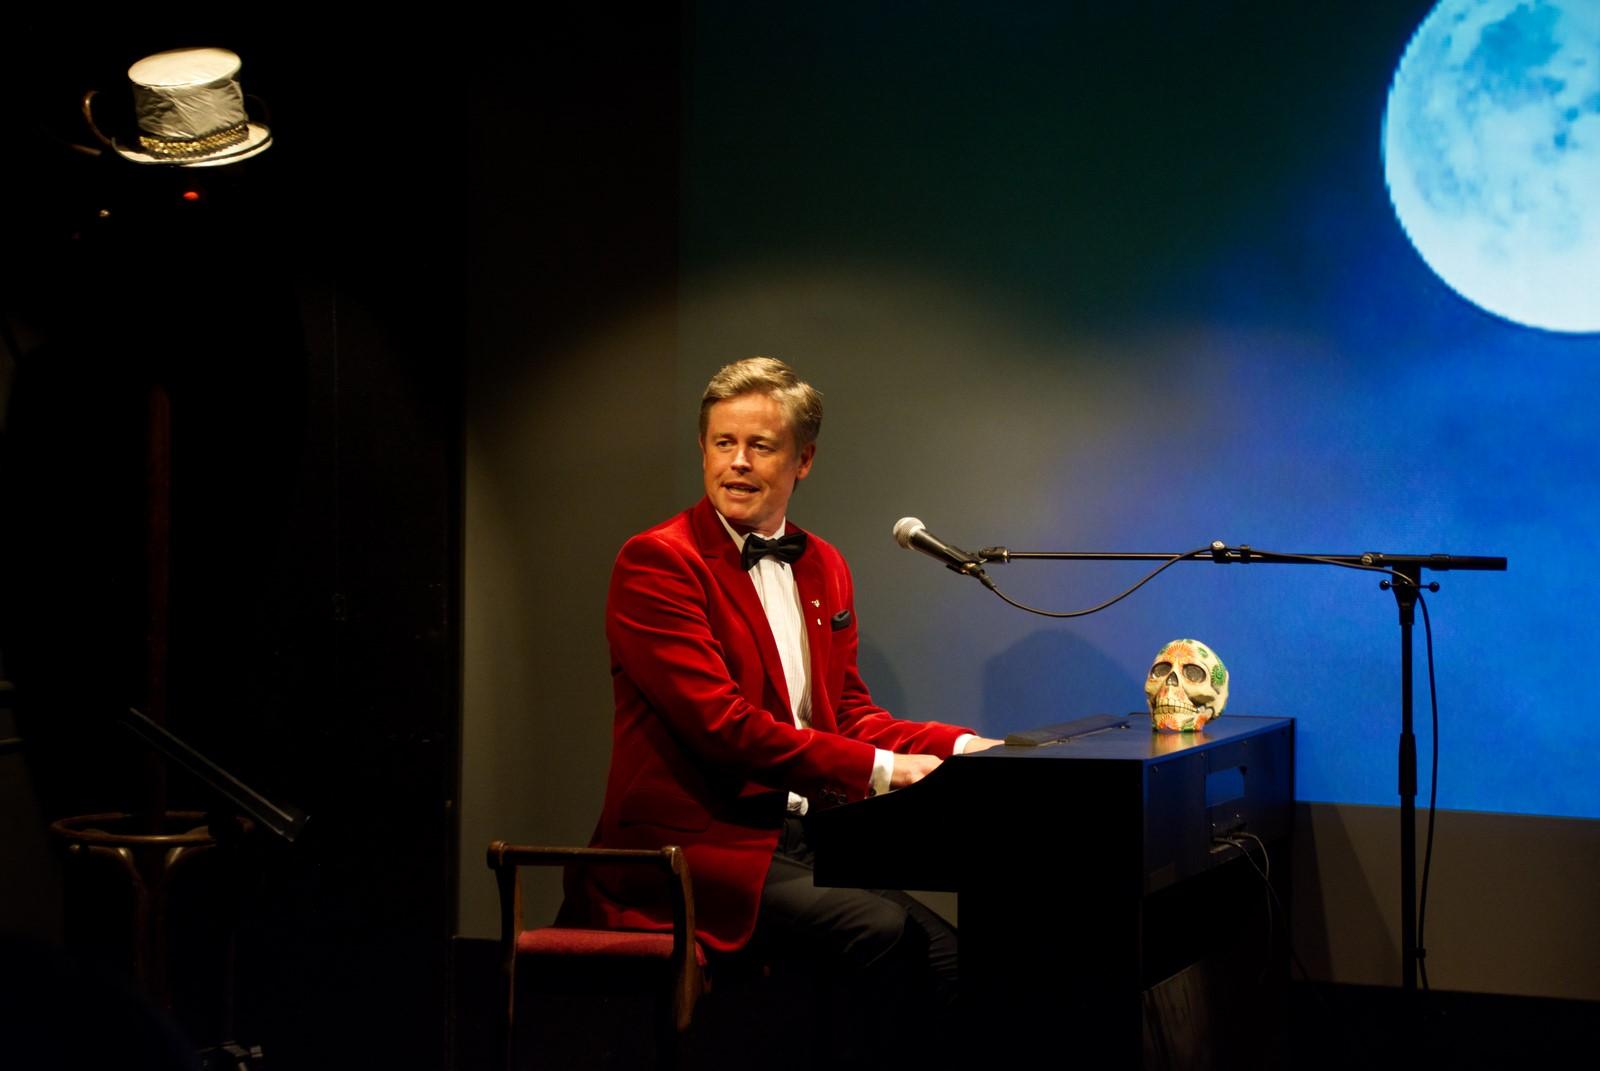 Anmeldelse: Late Night Show, Posthus Teatret